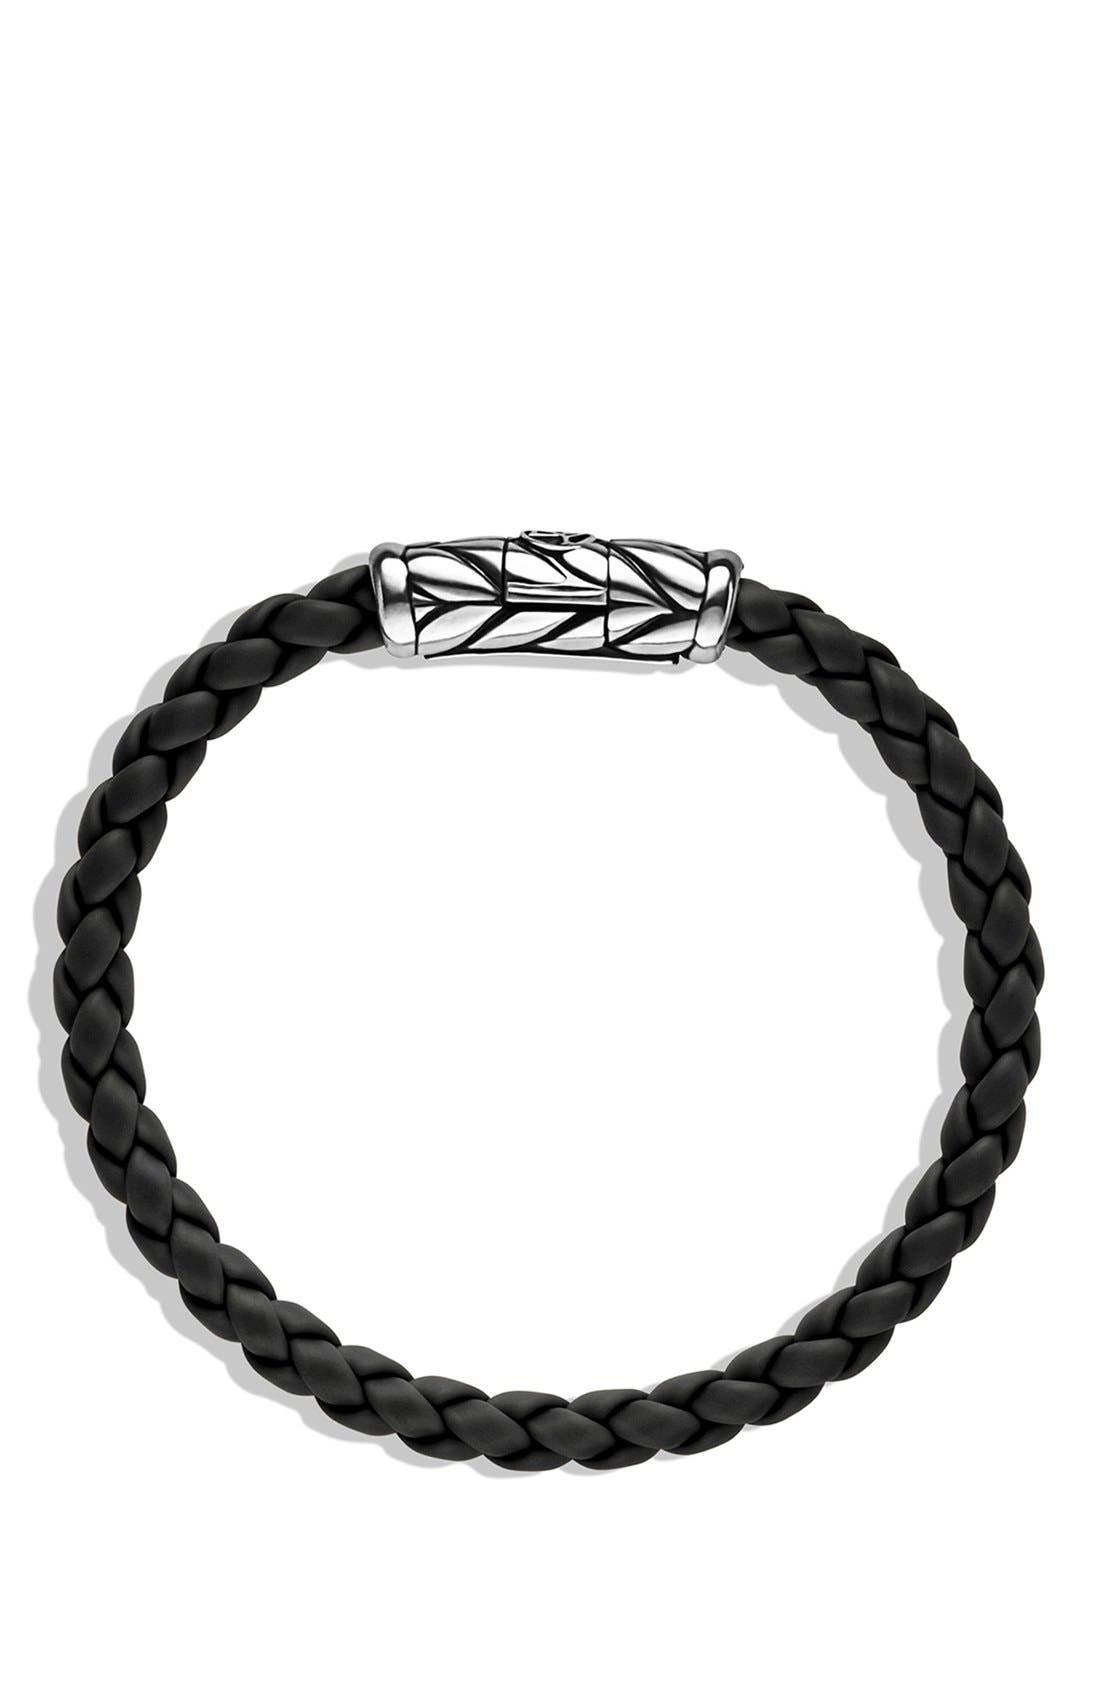 'Chevron' Woven Rubber Bracelet,                             Alternate thumbnail 2, color,                             BLACK